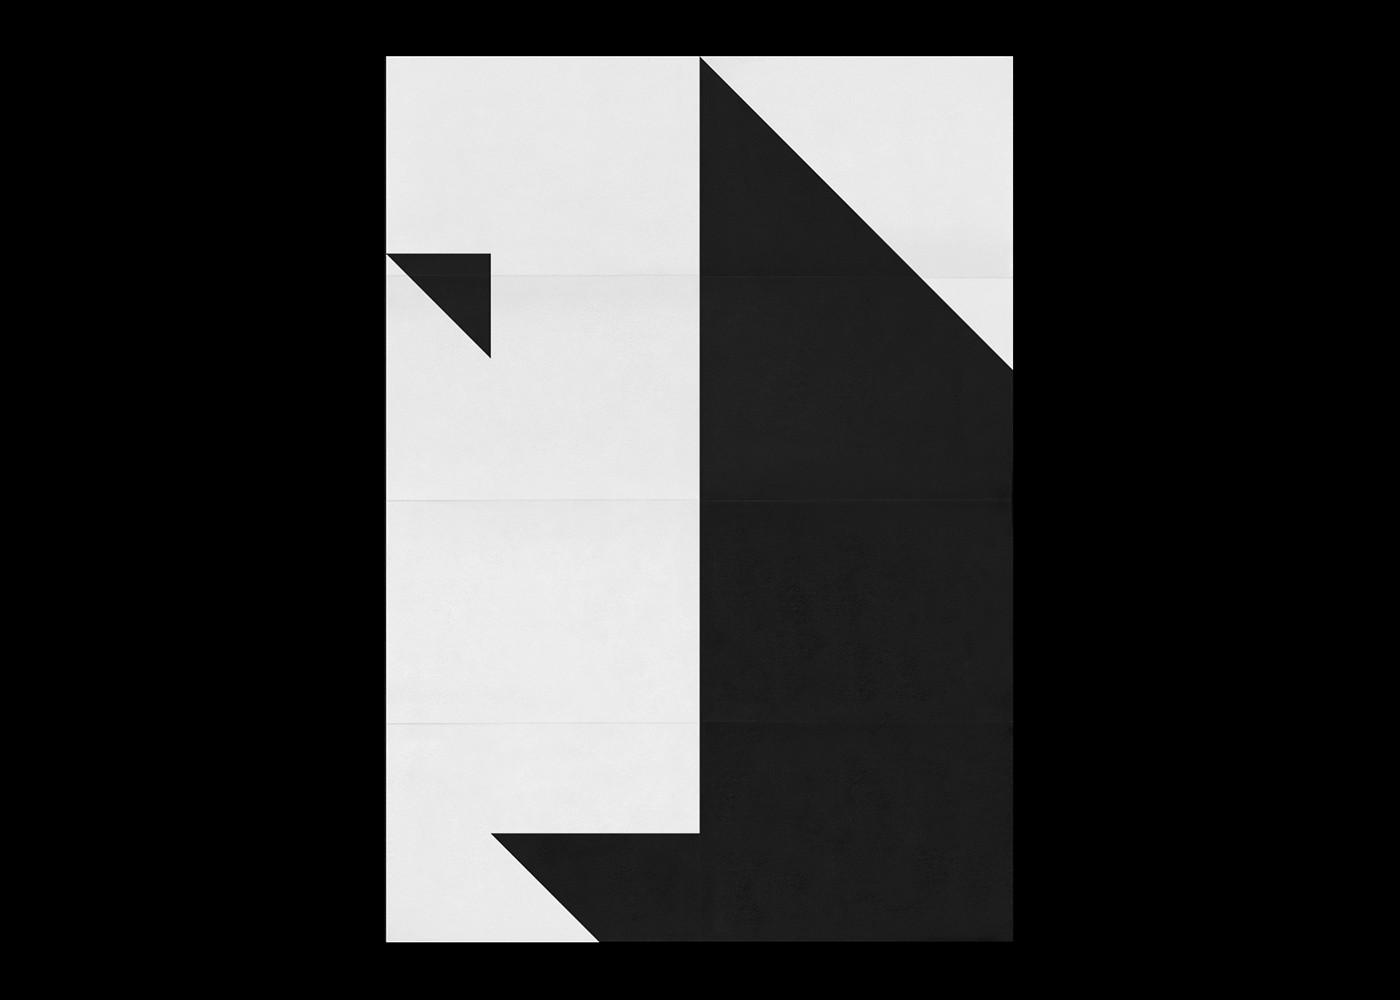 Fabian Fohrer黑白海报设计